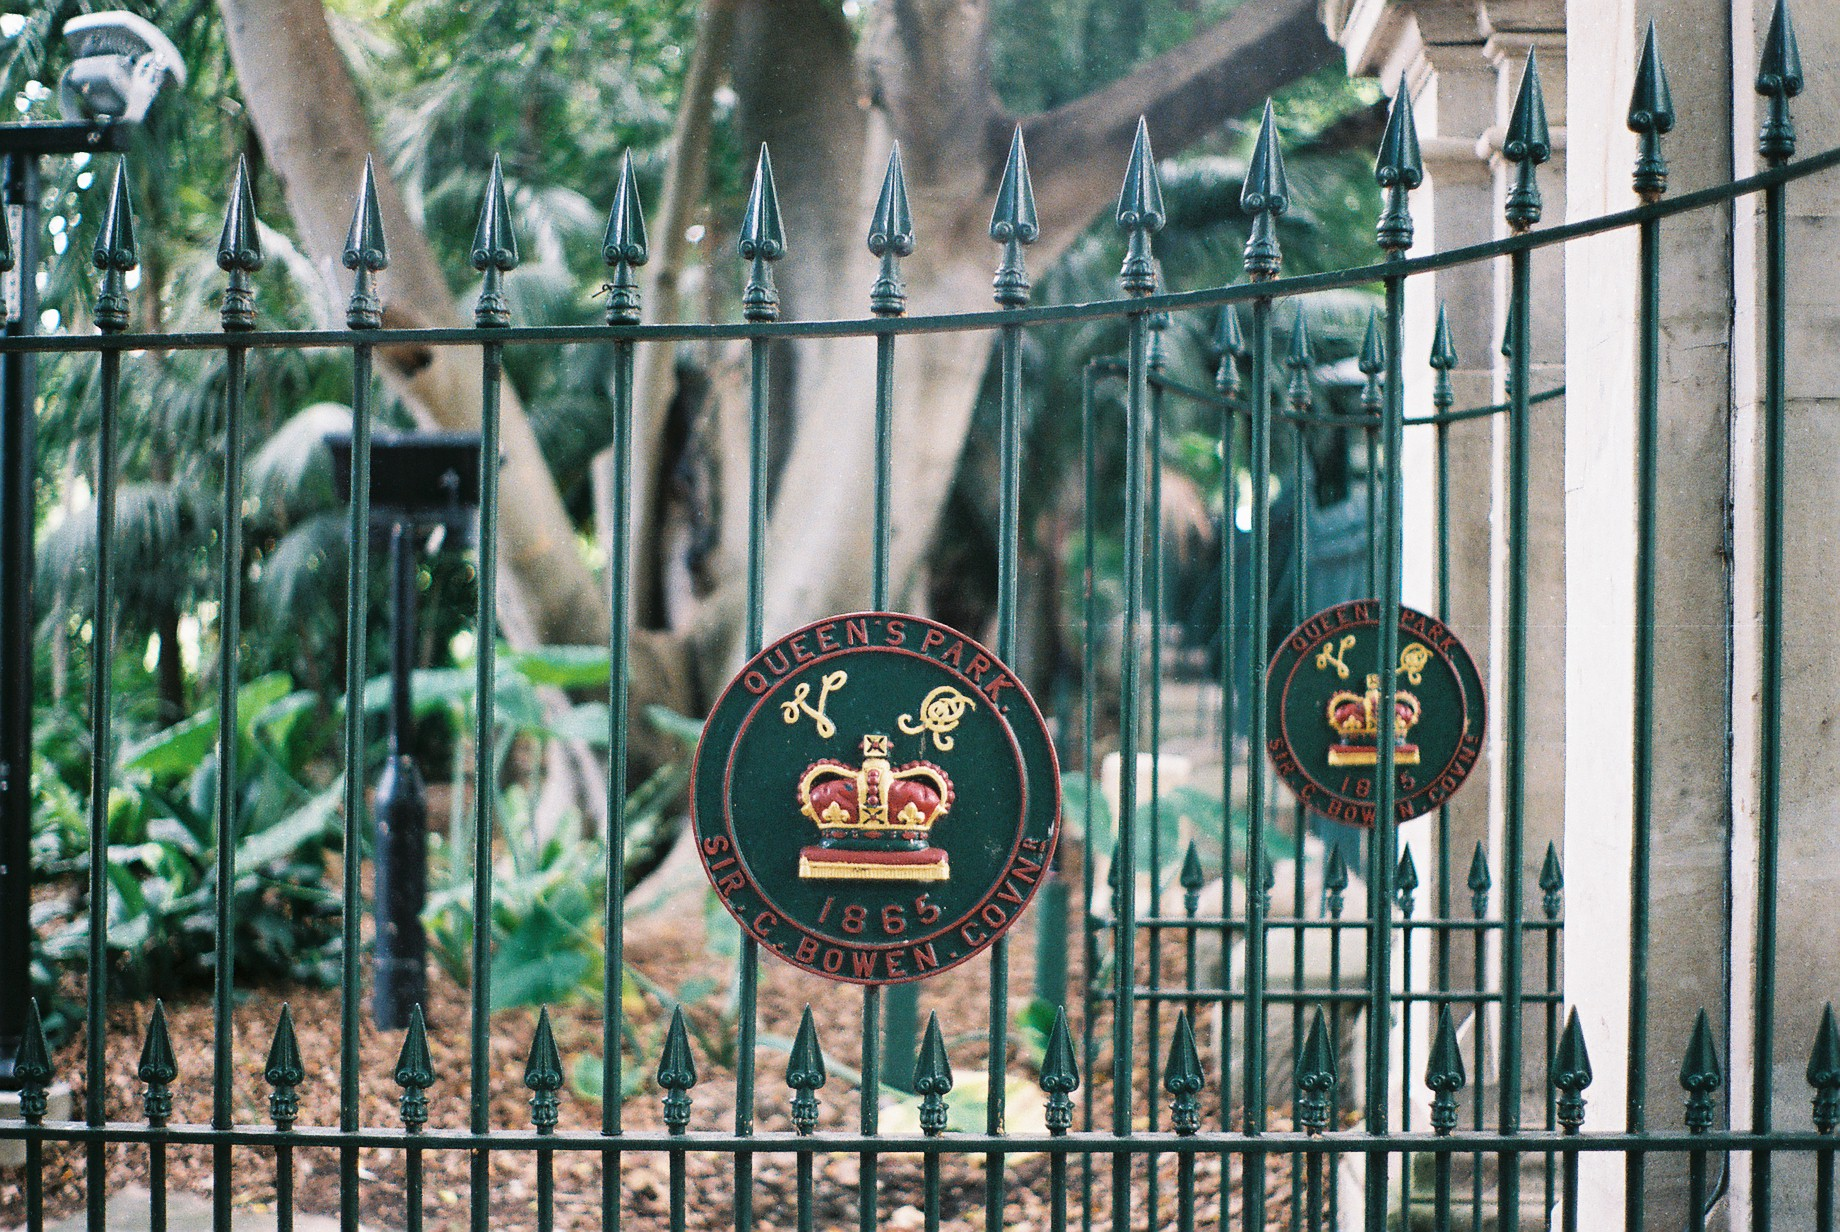 Brisbane Botanic Gardens 35mm Film Travel Photographer